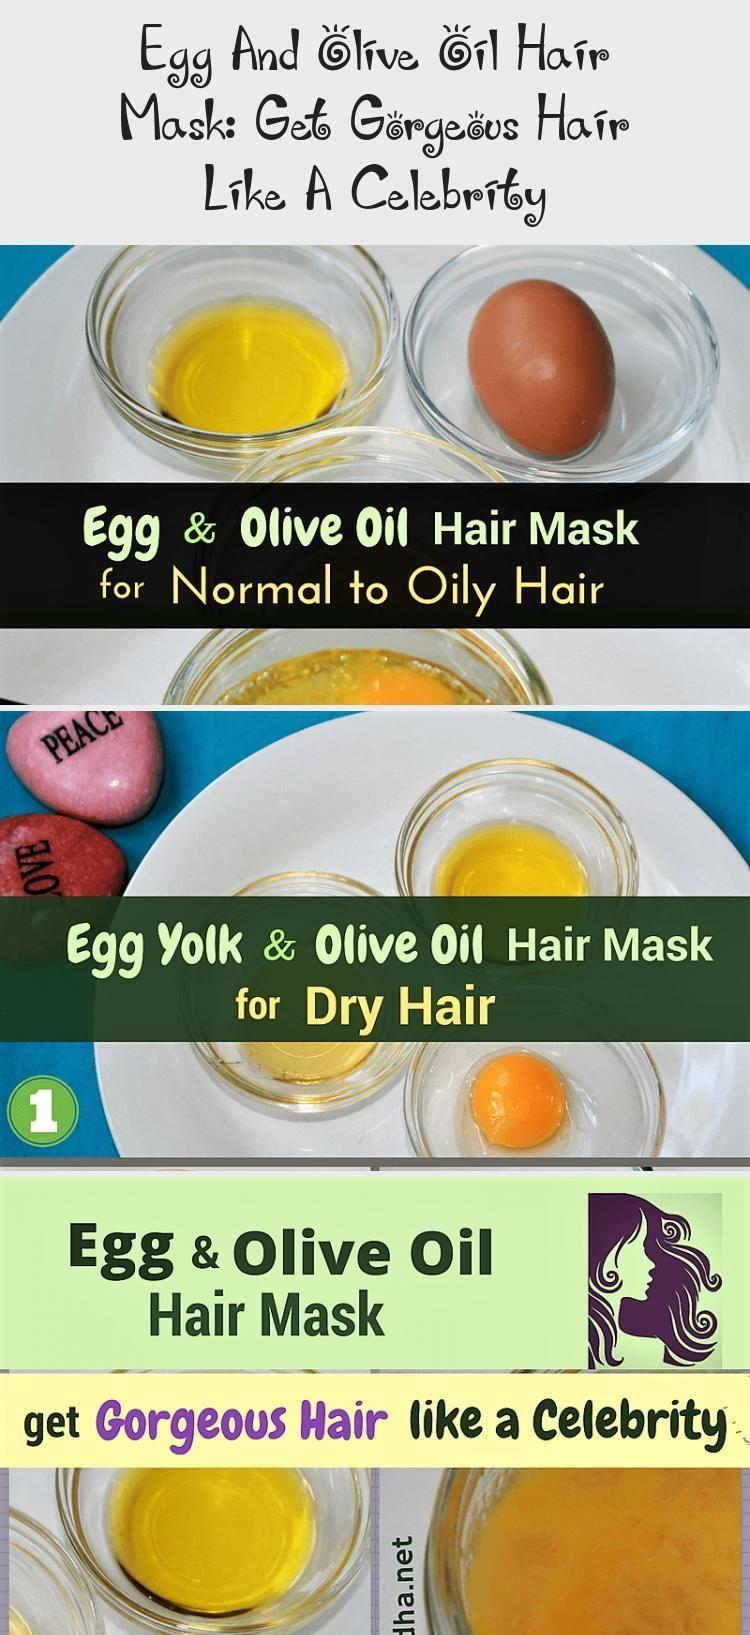 olive oil and egg hair mask for hair growth #hairgrowthTimeline #hairgrowthSharkTank #Curlyhairgrowth #hairgrowthTips -  olive oil and egg hair mask for hair growth #hairgrowthTimeline #hairgrowthSharkTank #Curlyhairgrowth #hairgrowthTips   - #castoroilforHairGrowth #HairGrowth #HairGrowthafricanamerican #HairGrowthbeforeandafter #HairGrowthchart #HairGrowthdiy #HairGrowthfaster #HairGrowthinaweek #HairGrowthmask #HairGrowthonion #HairGrowthproducts #HairGrowthshampoo #HairGrowthsuperfast #Hair